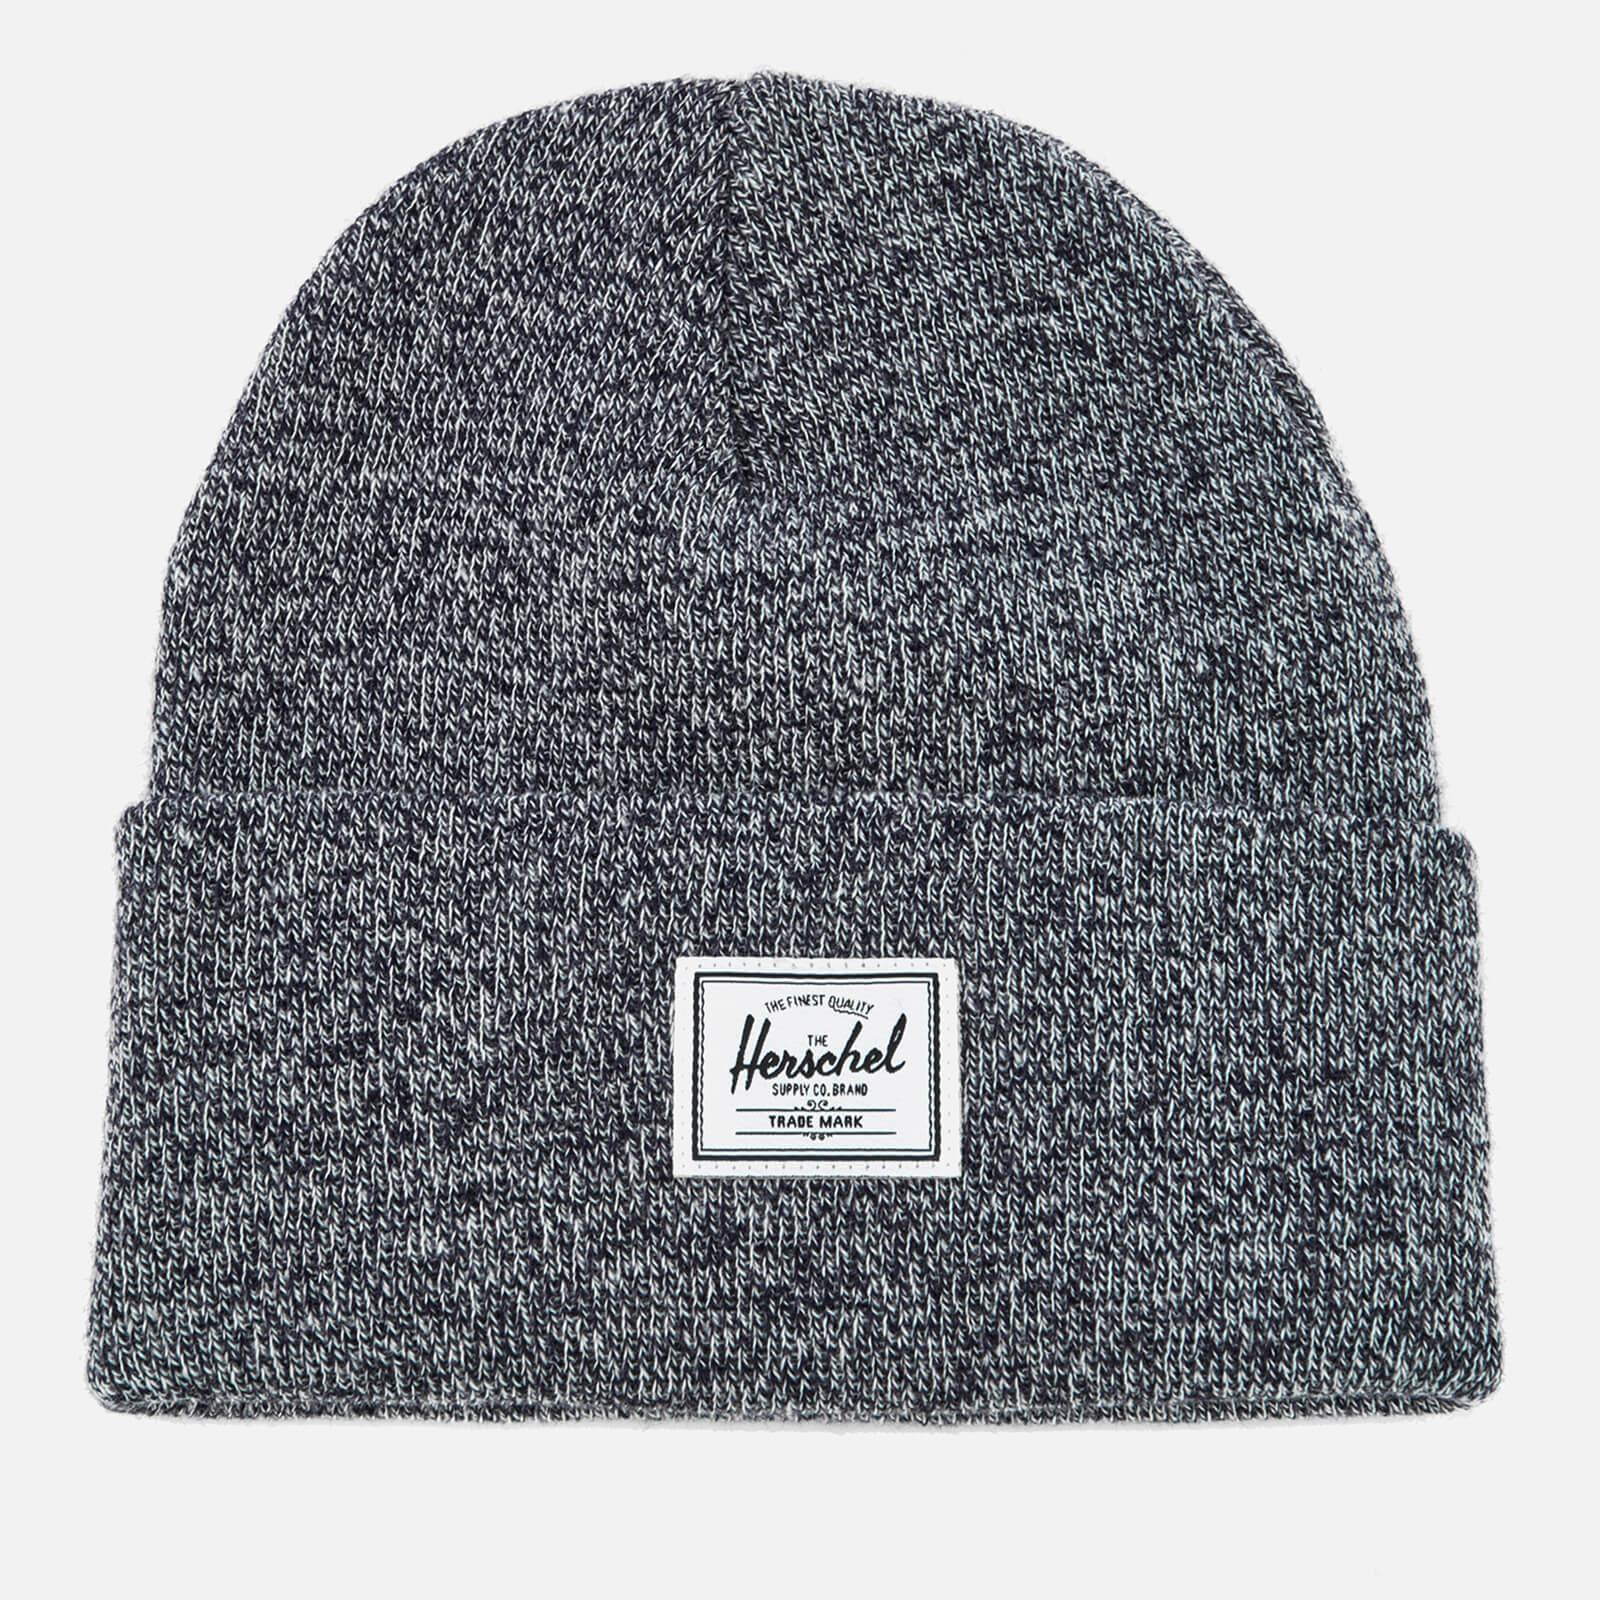 e3474c69890 Lyst - Herschel Supply Co. Elmer Hat in Gray for Men